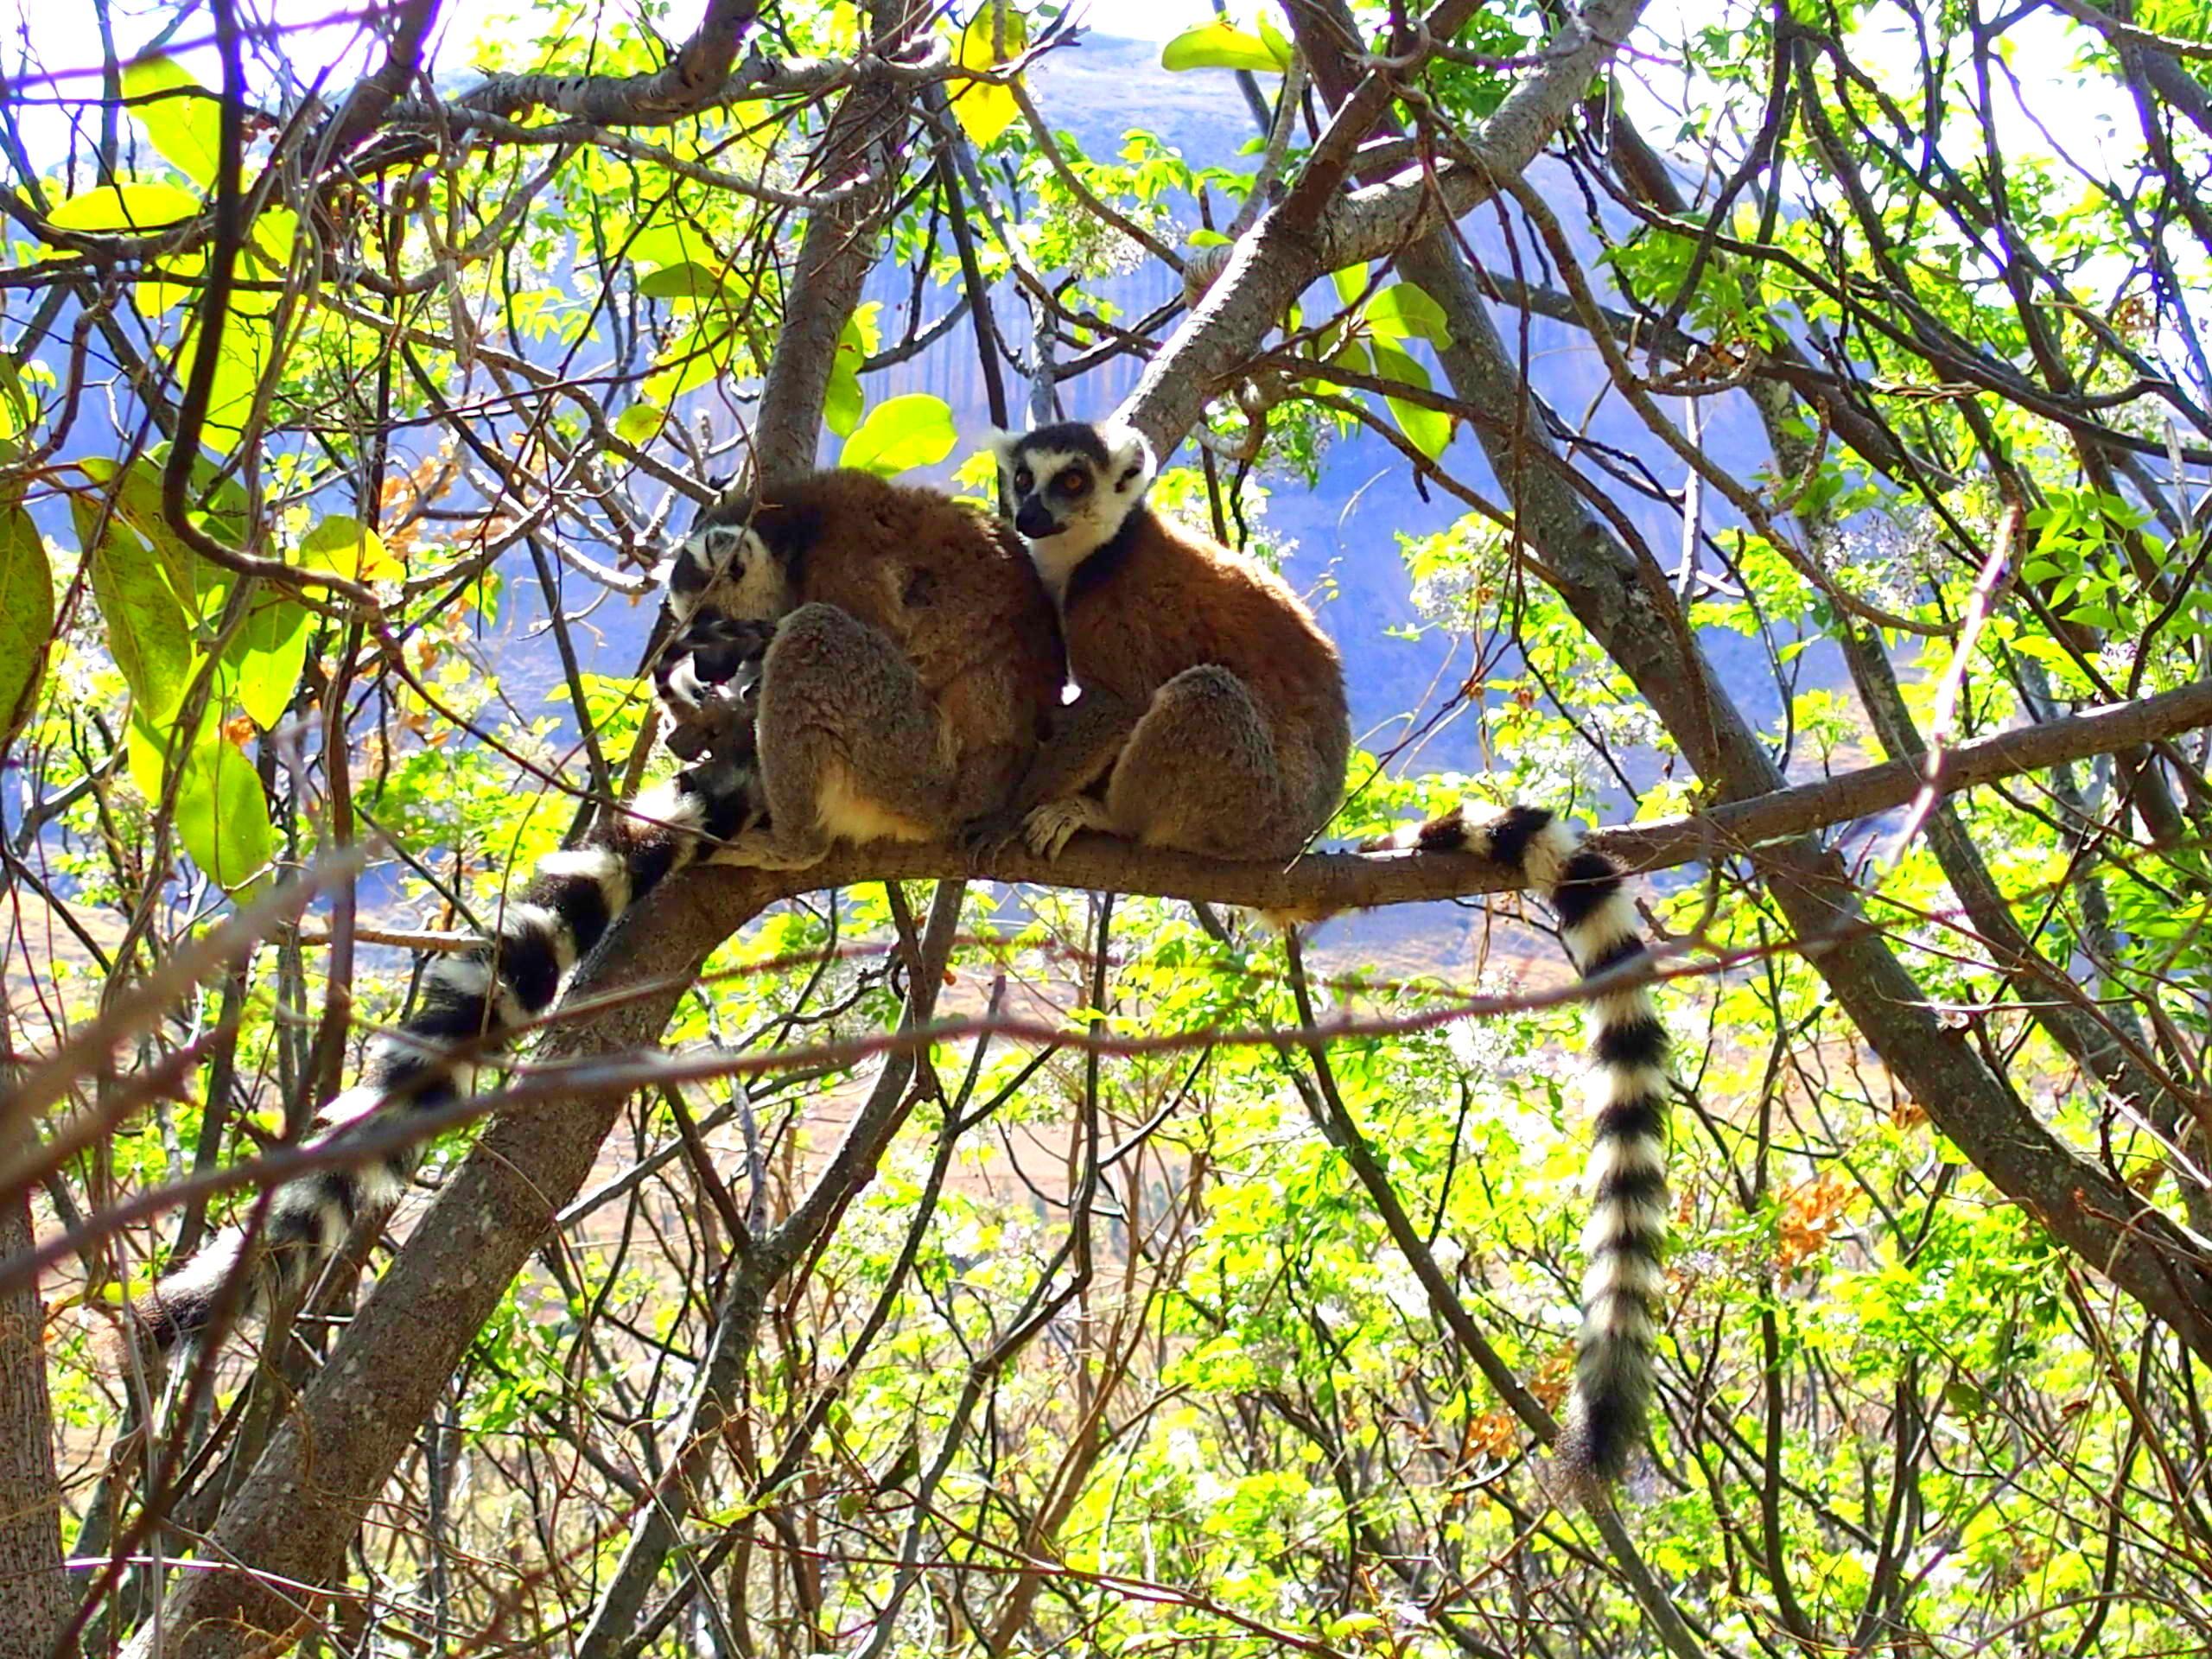 Duo-de-makis-Ranomafana-Madagascar.